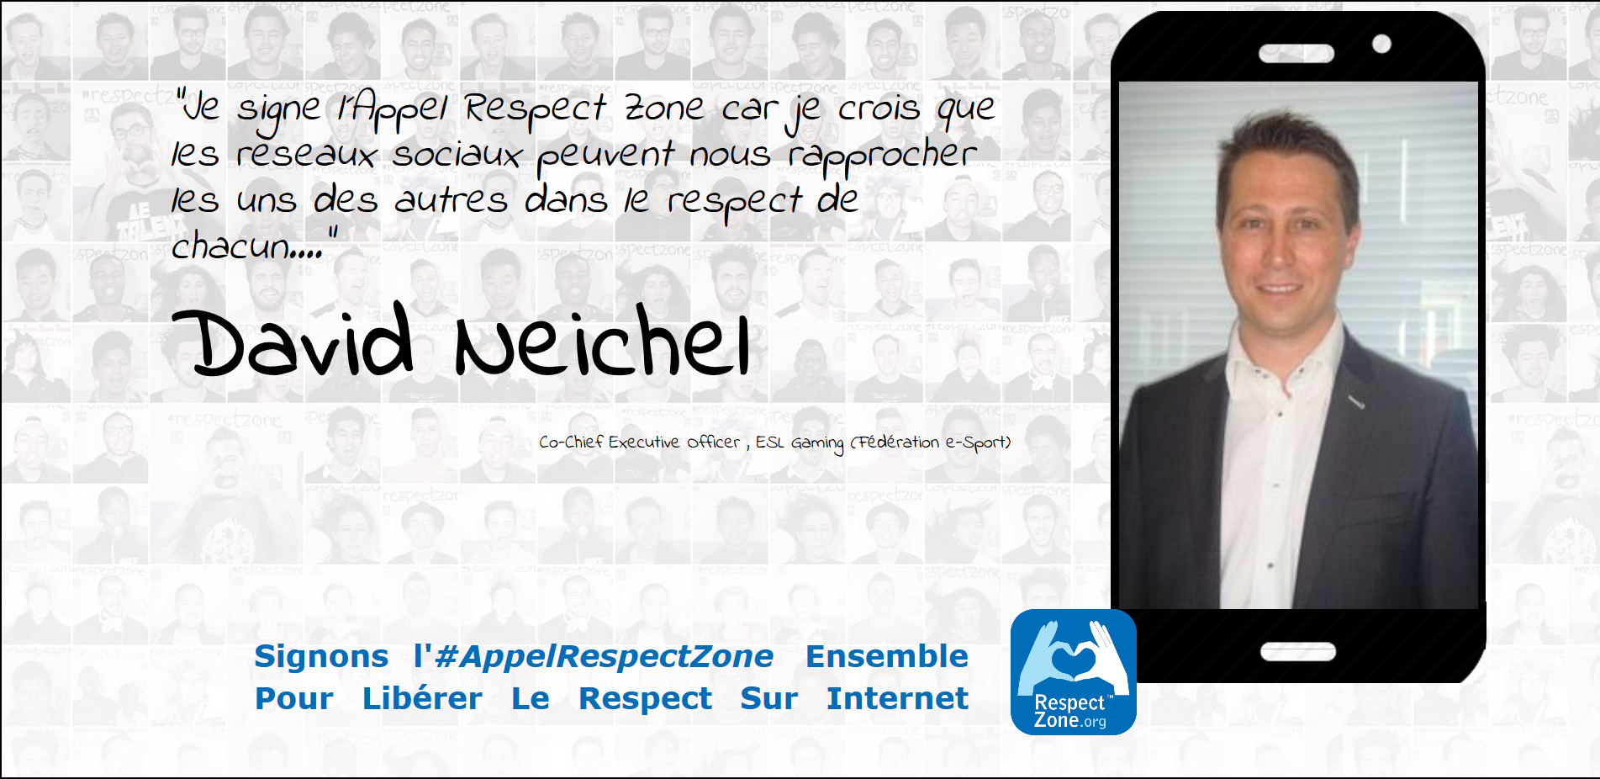 David Neichel